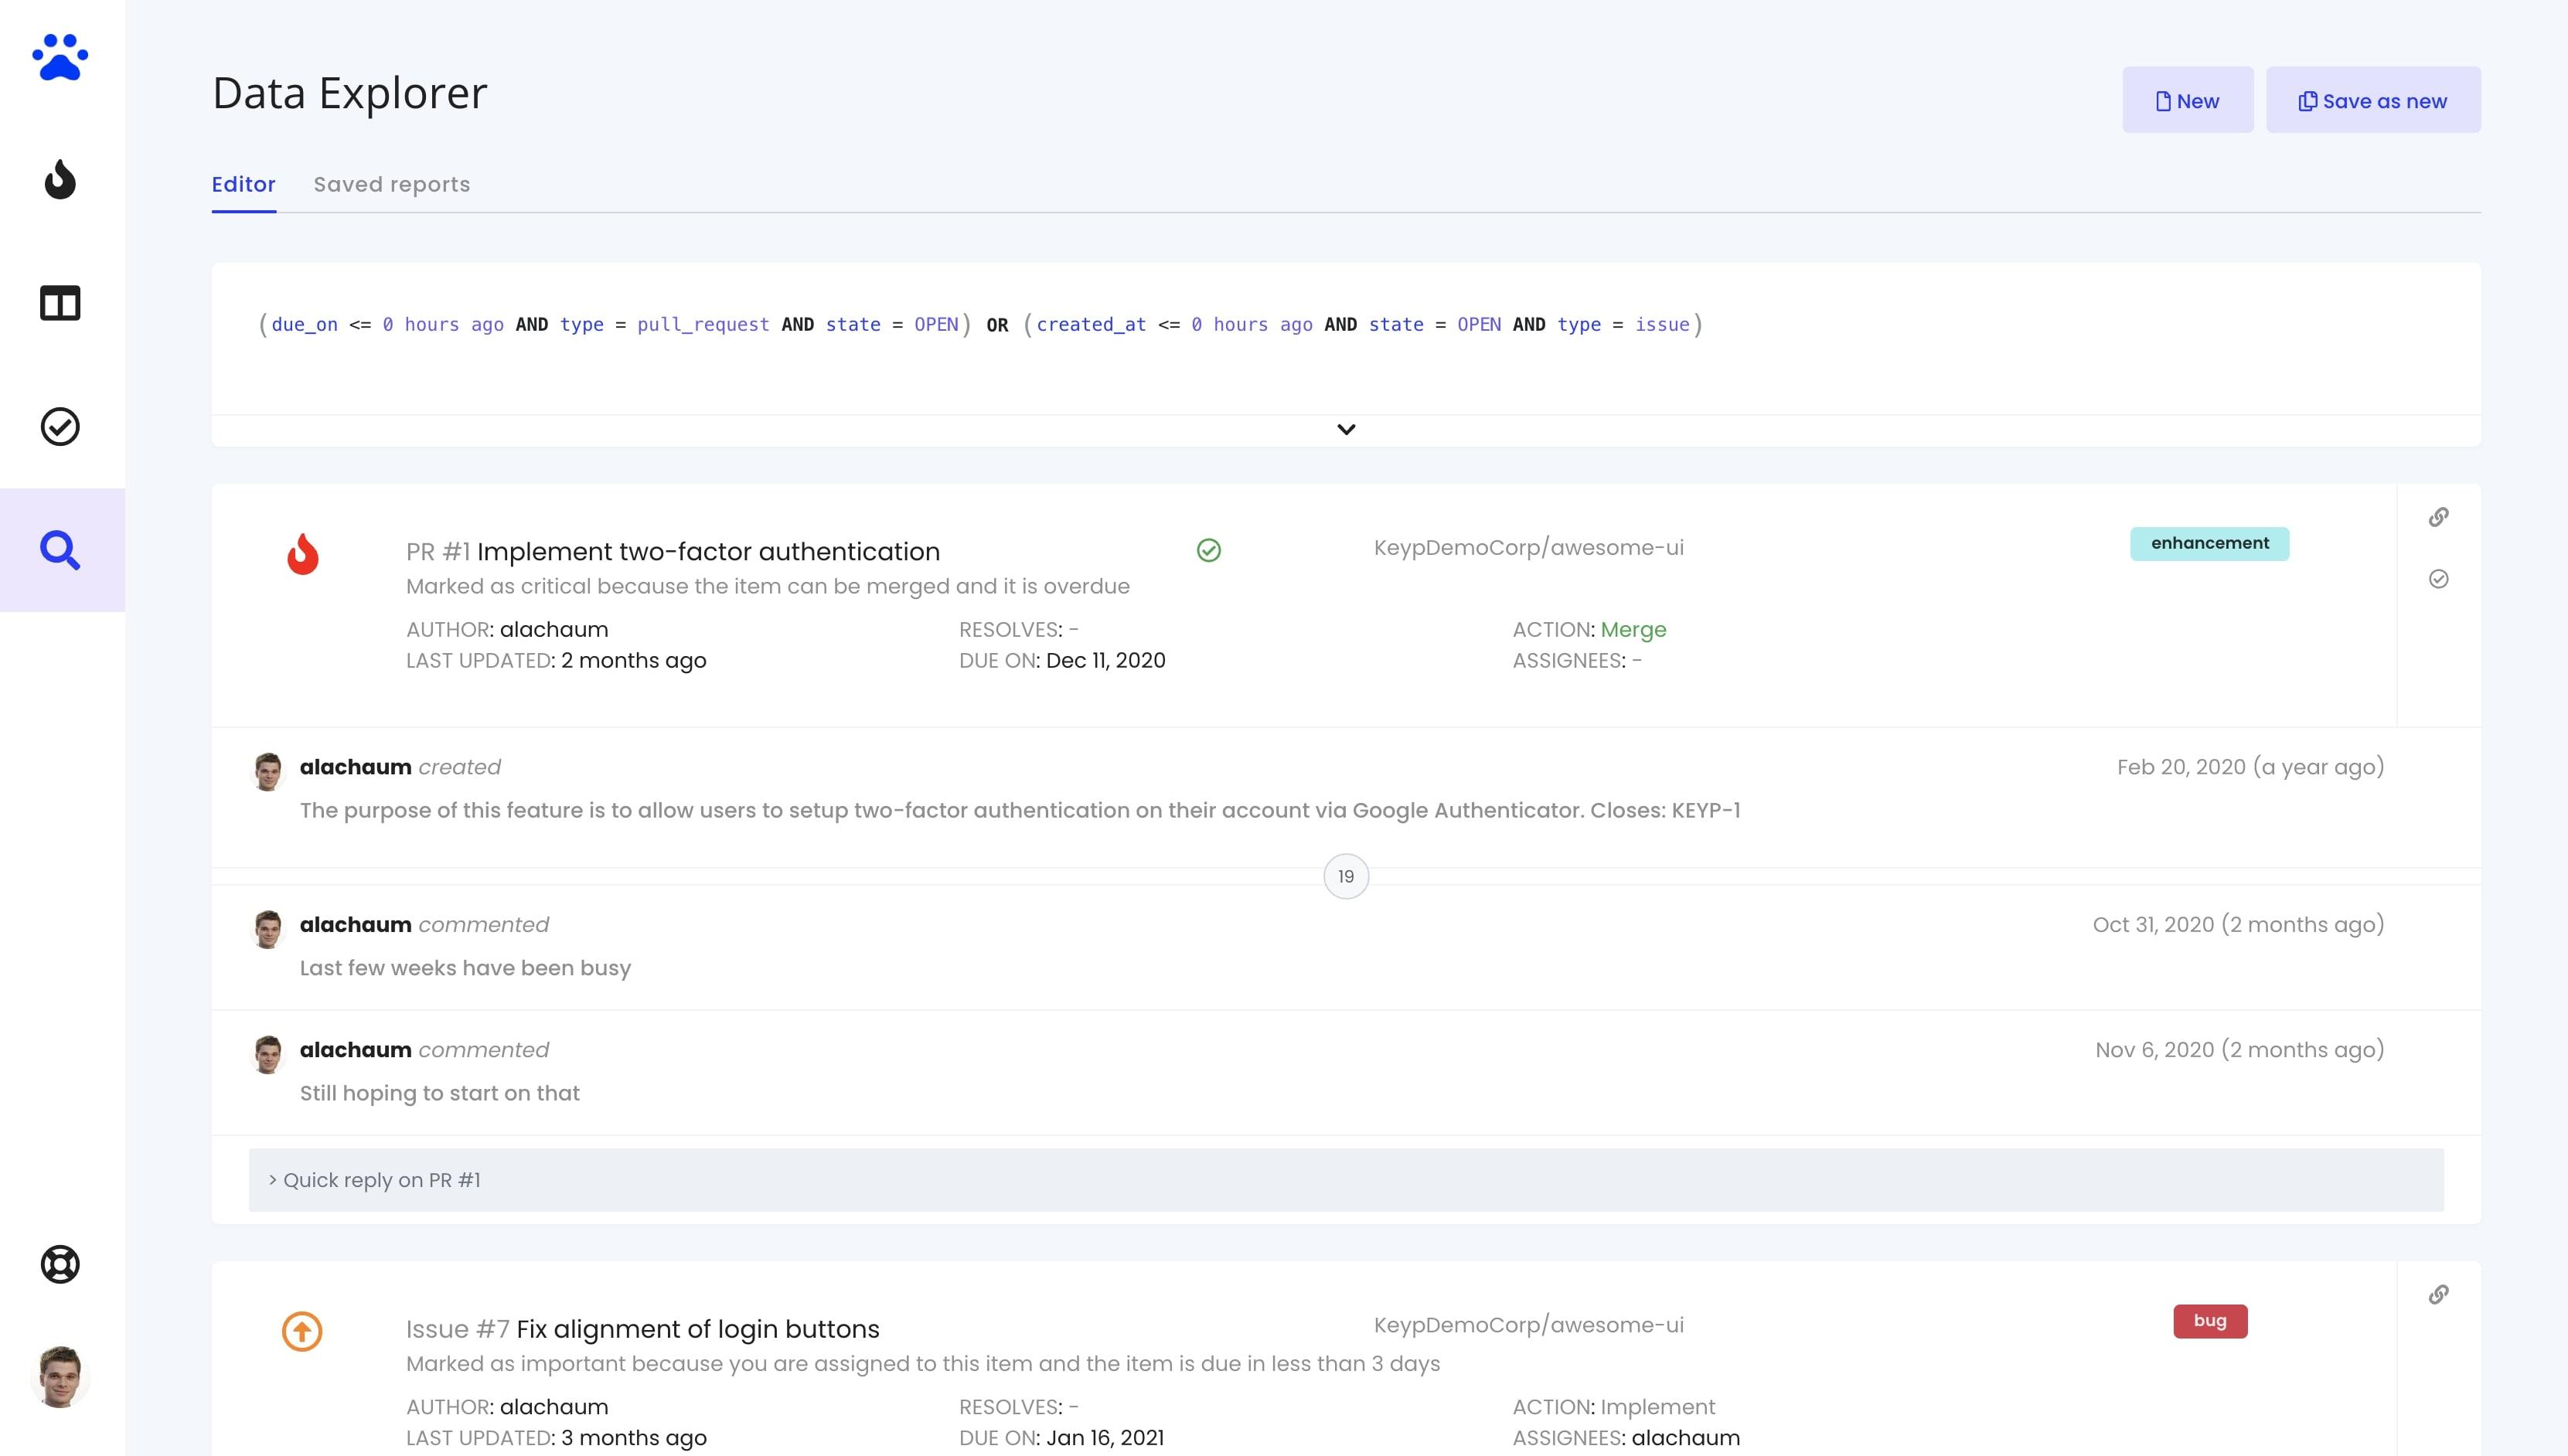 Bitbucket - Data Explorer